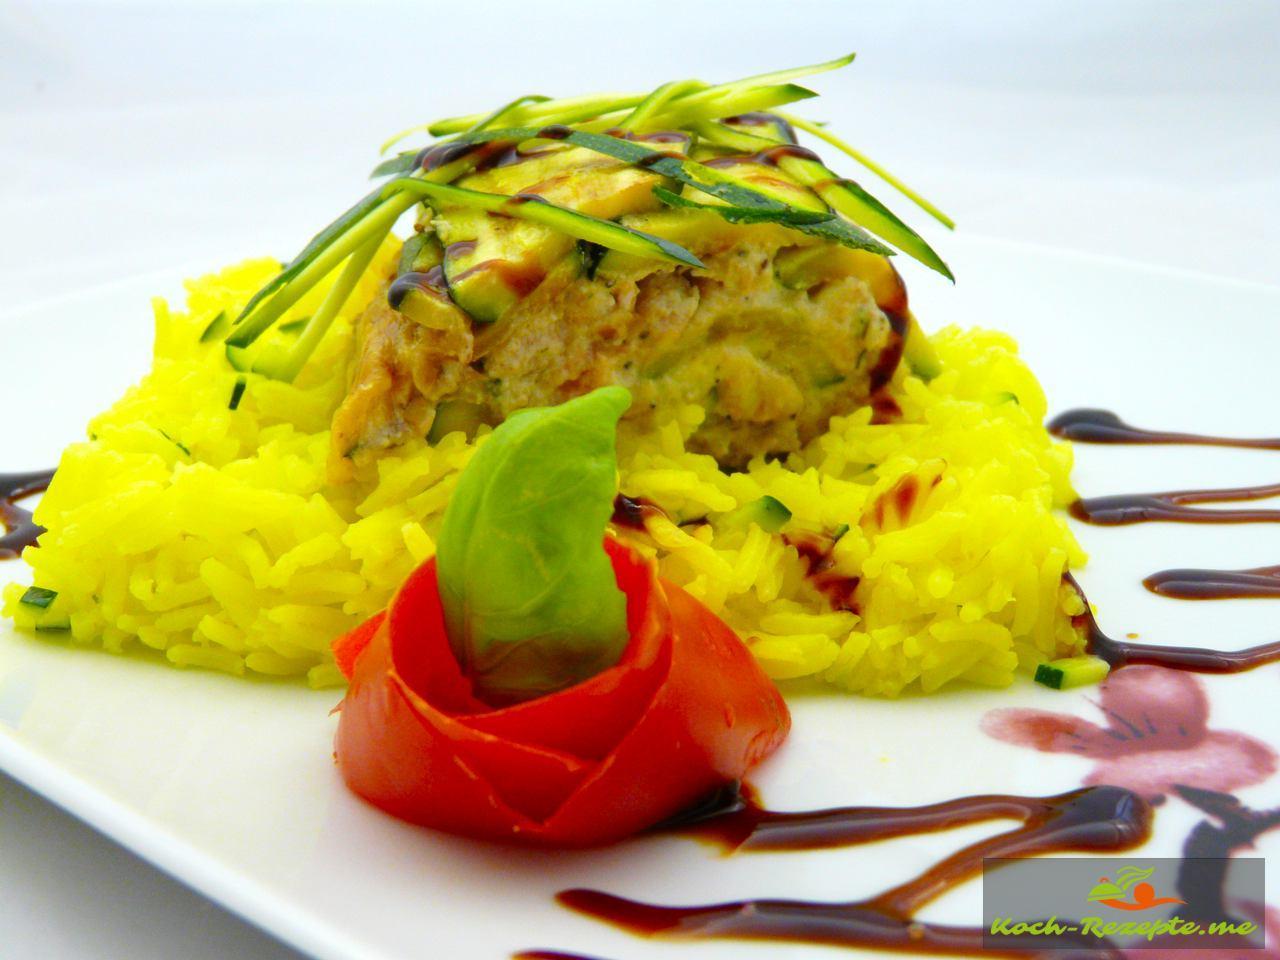 Lachs-Zucchini Rolle